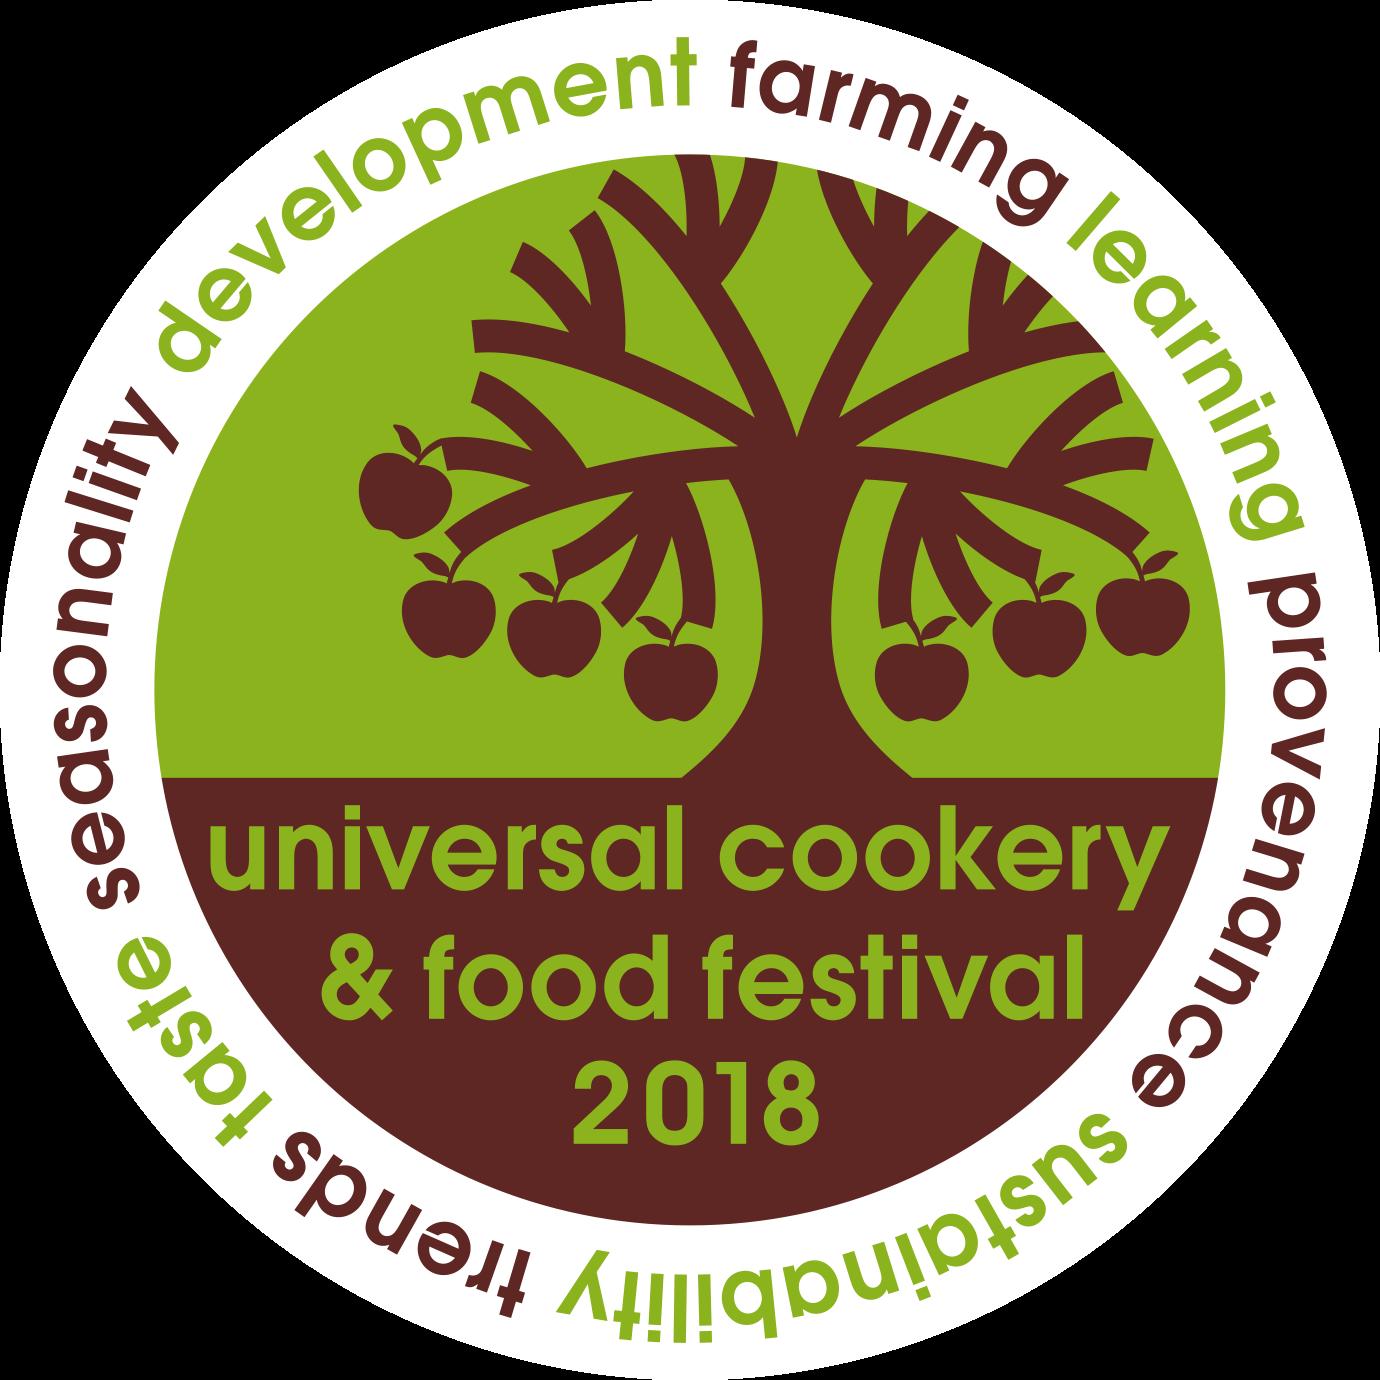 UCFF 2018 logo